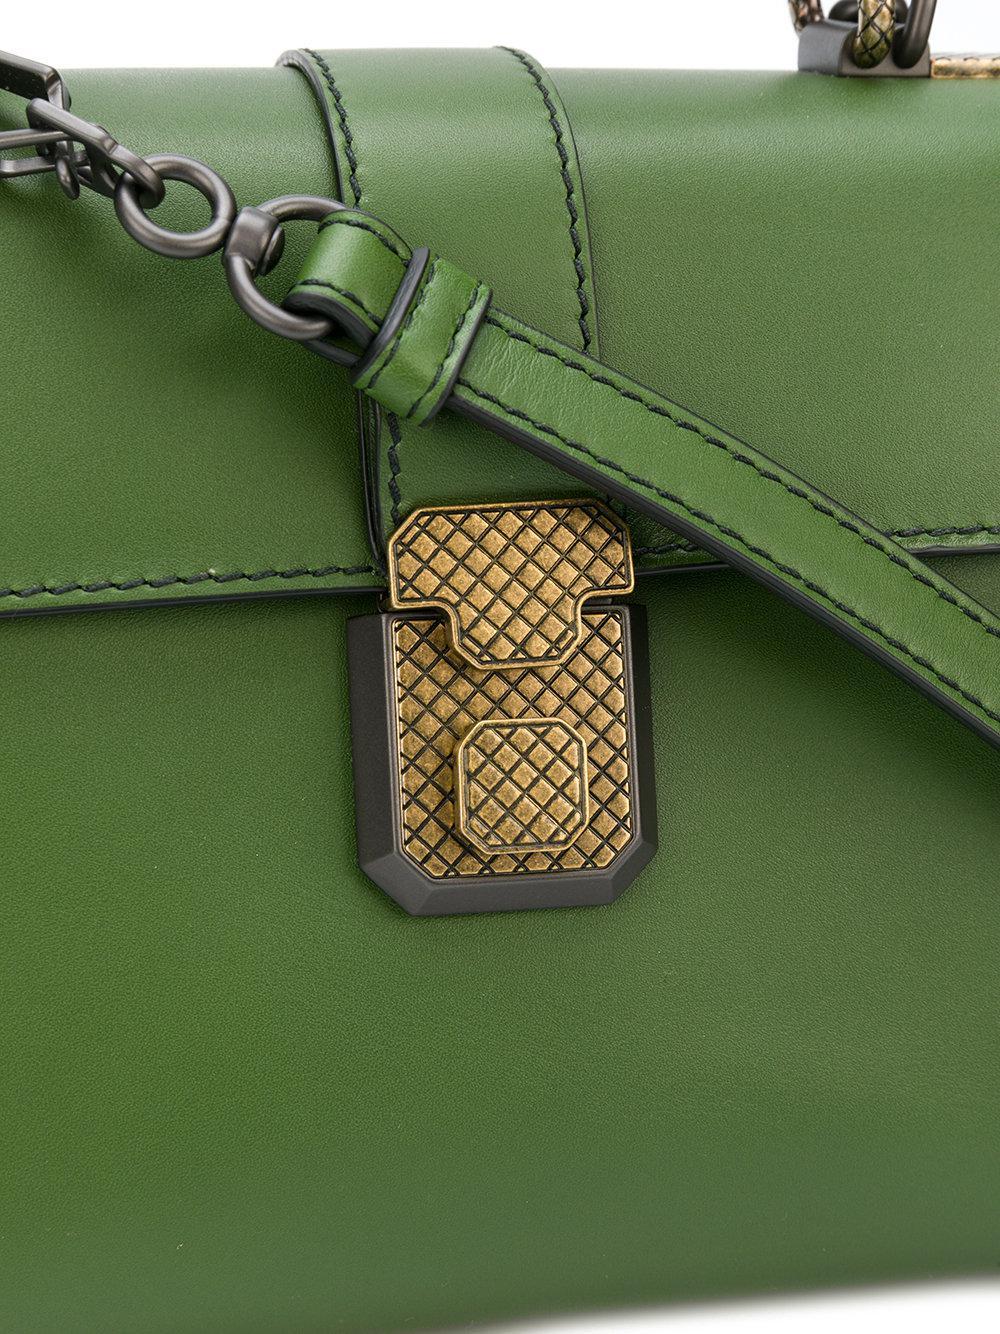 c3215cbeb6a8 Lyst - Bottega Veneta Ivy Nero Calf Small Piazza Bag in Green